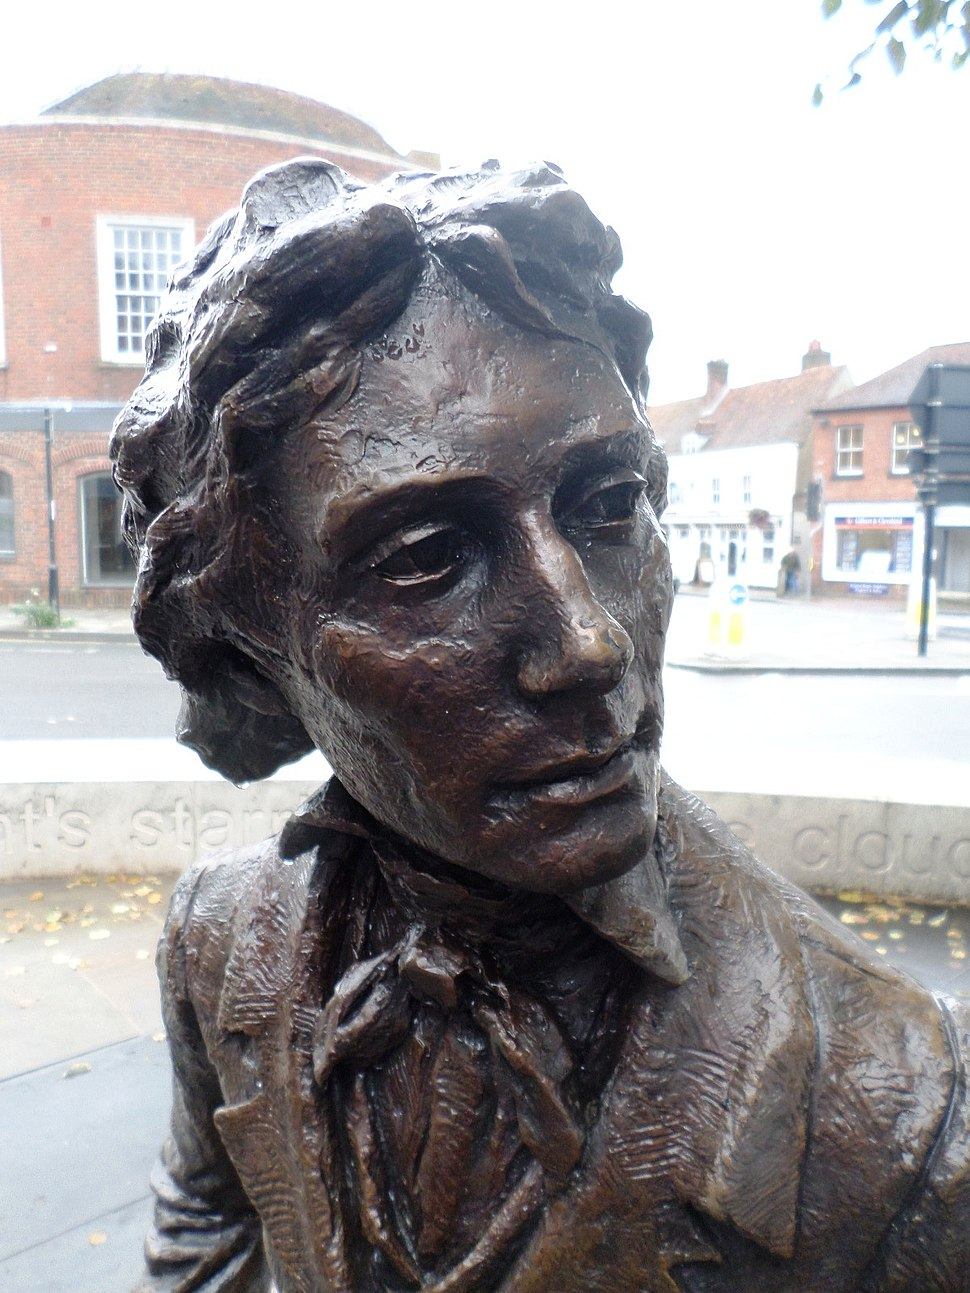 Poet John Keats, by sculptor Vincent Gray